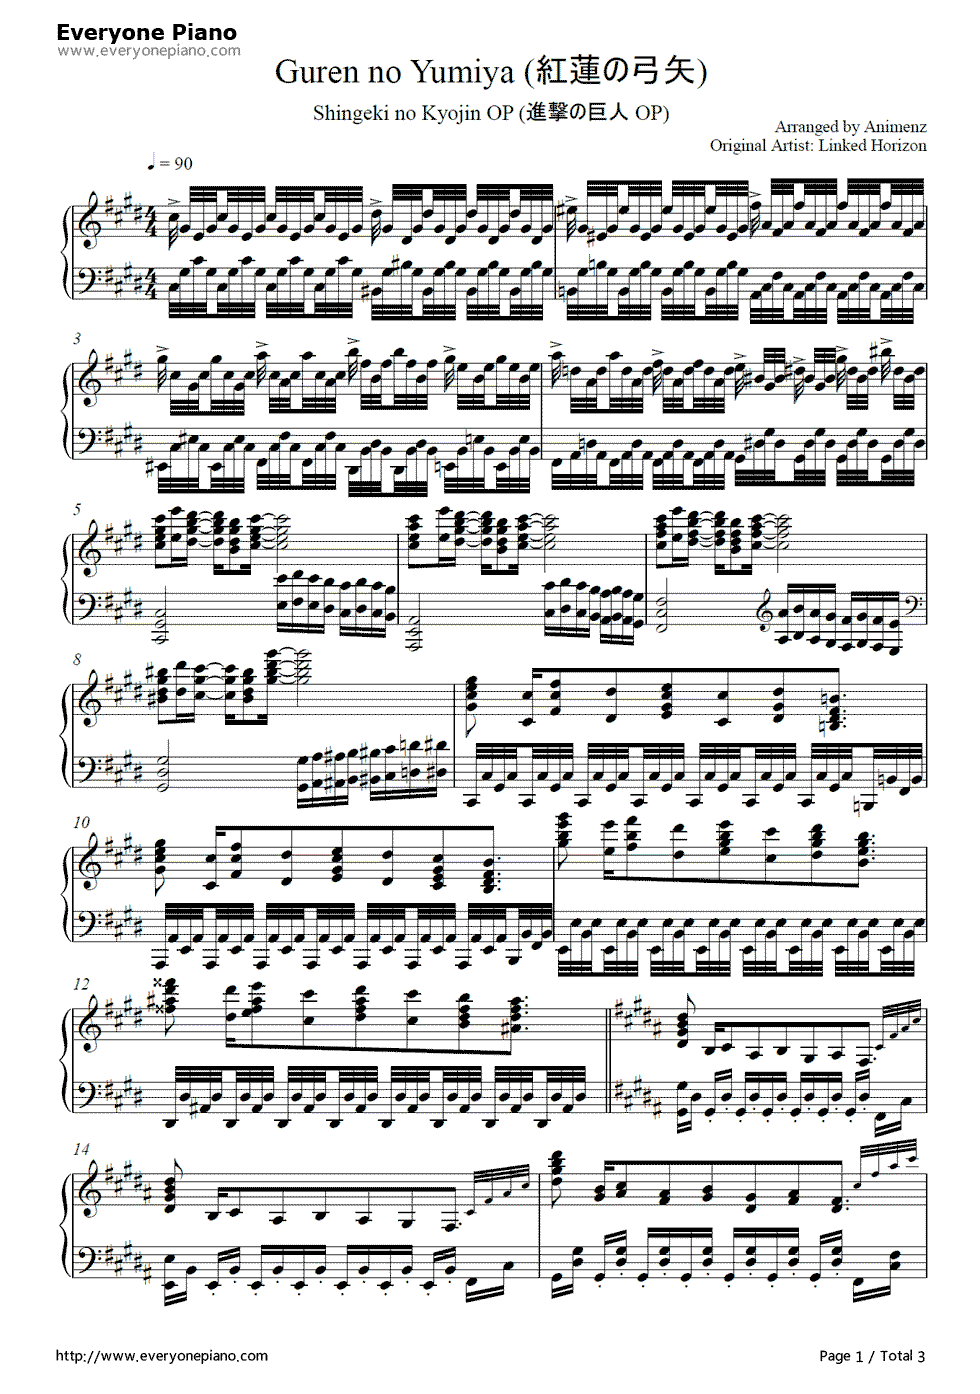 Guren no Yumiya Sheet music I HAVE FOUND ITTTTTTTTT